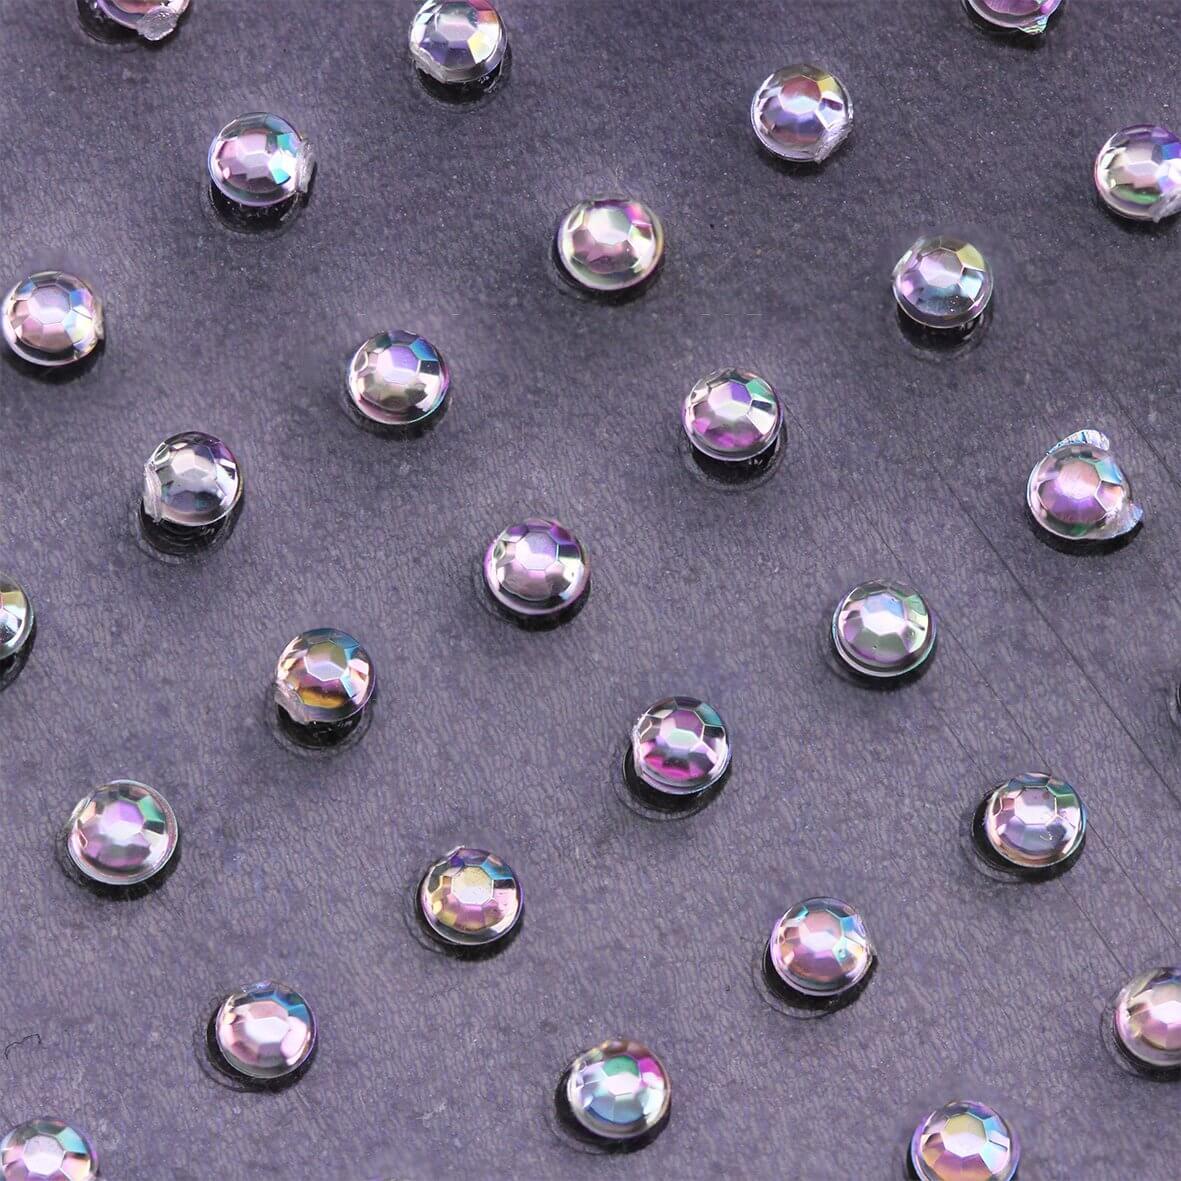 2mm AB Crystal Self Adhesive Diamantes - Zoom